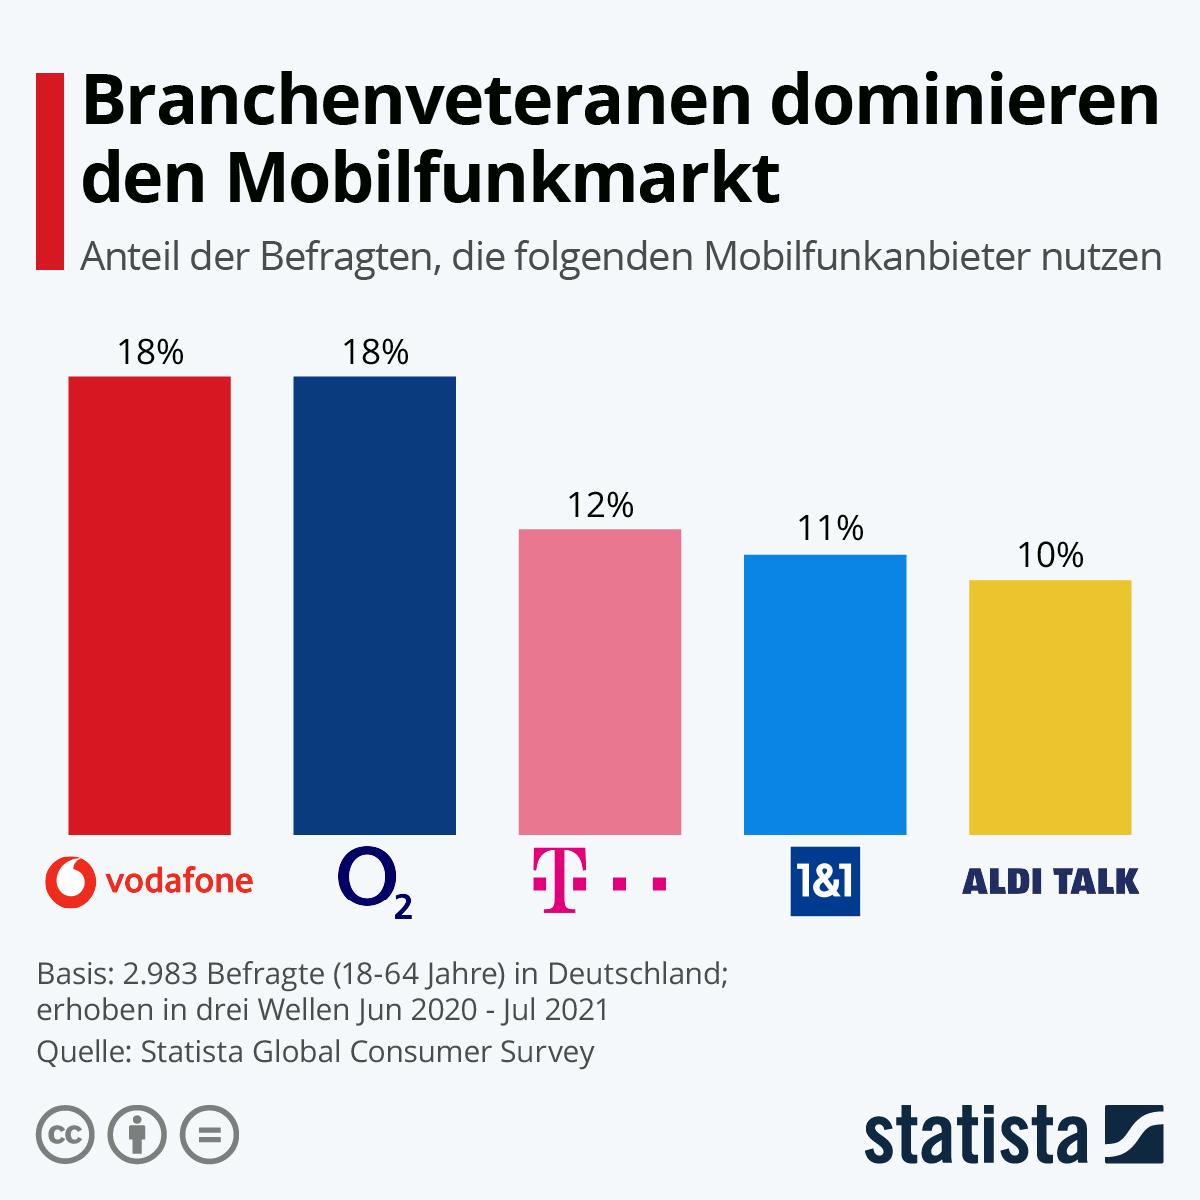 Infografik: Branchenveteranen dominieren den Mobilfunkmarkt | Statista